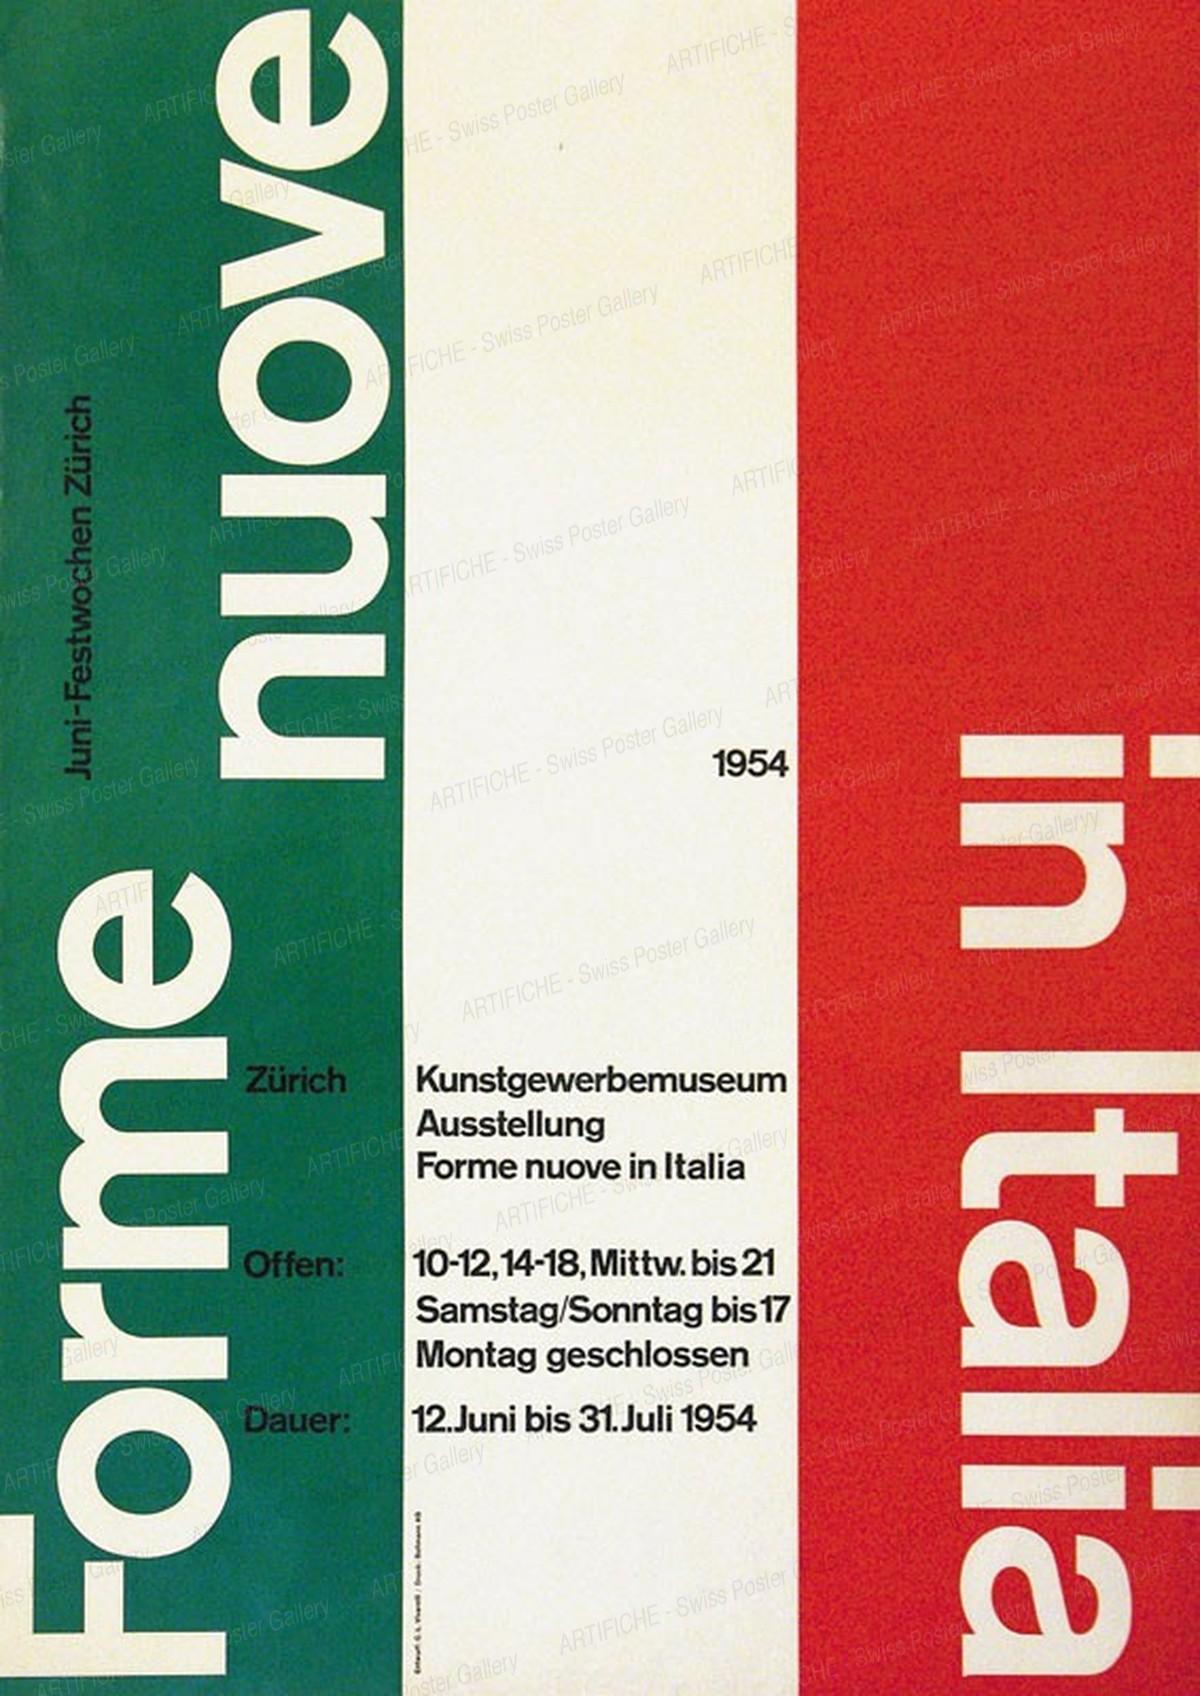 Kunstgewerbemuseum – Forme nuove in Italia, Carlo Vivarelli